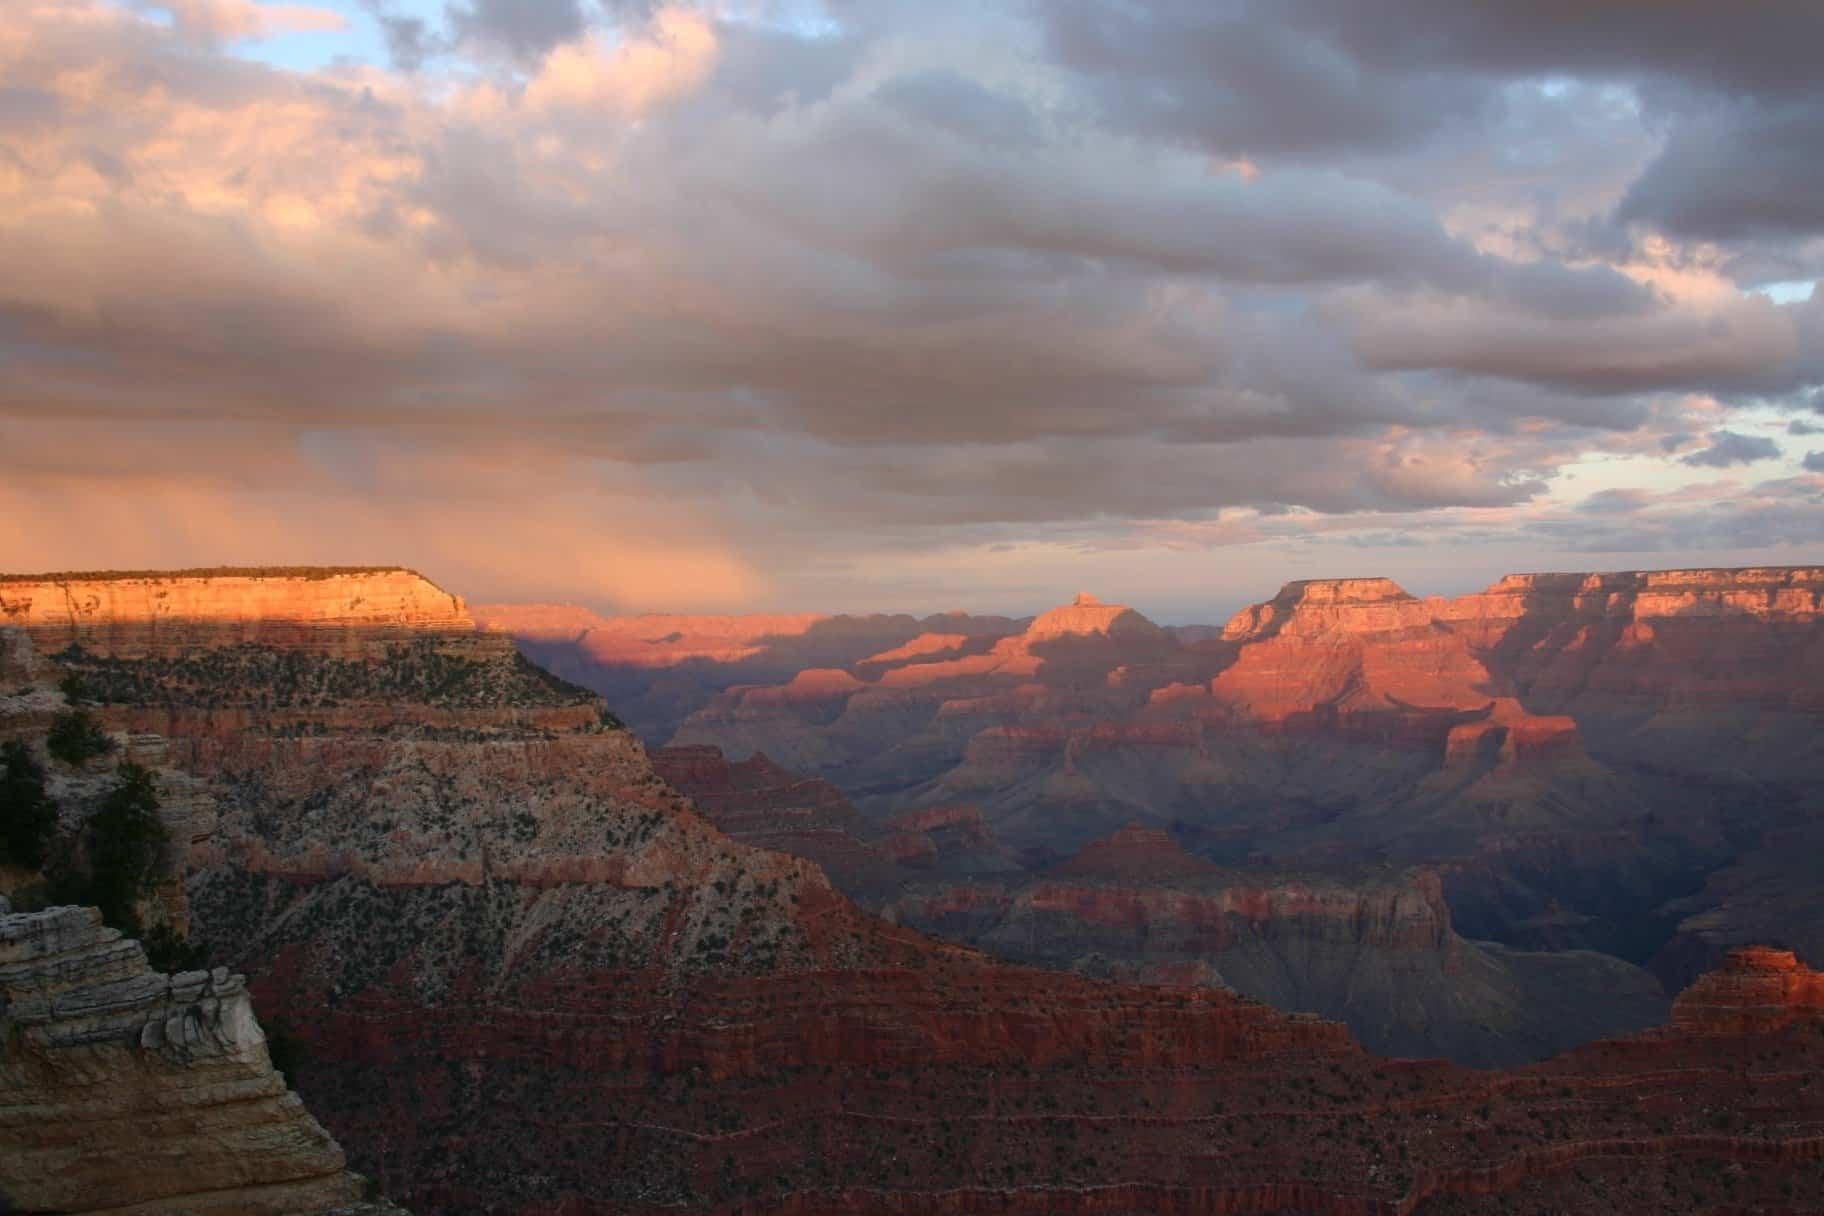 Cute Wallpaper Hd 1080p Free Download Gratis Billede Sunset Landskab Dawn Cloud Bjerg